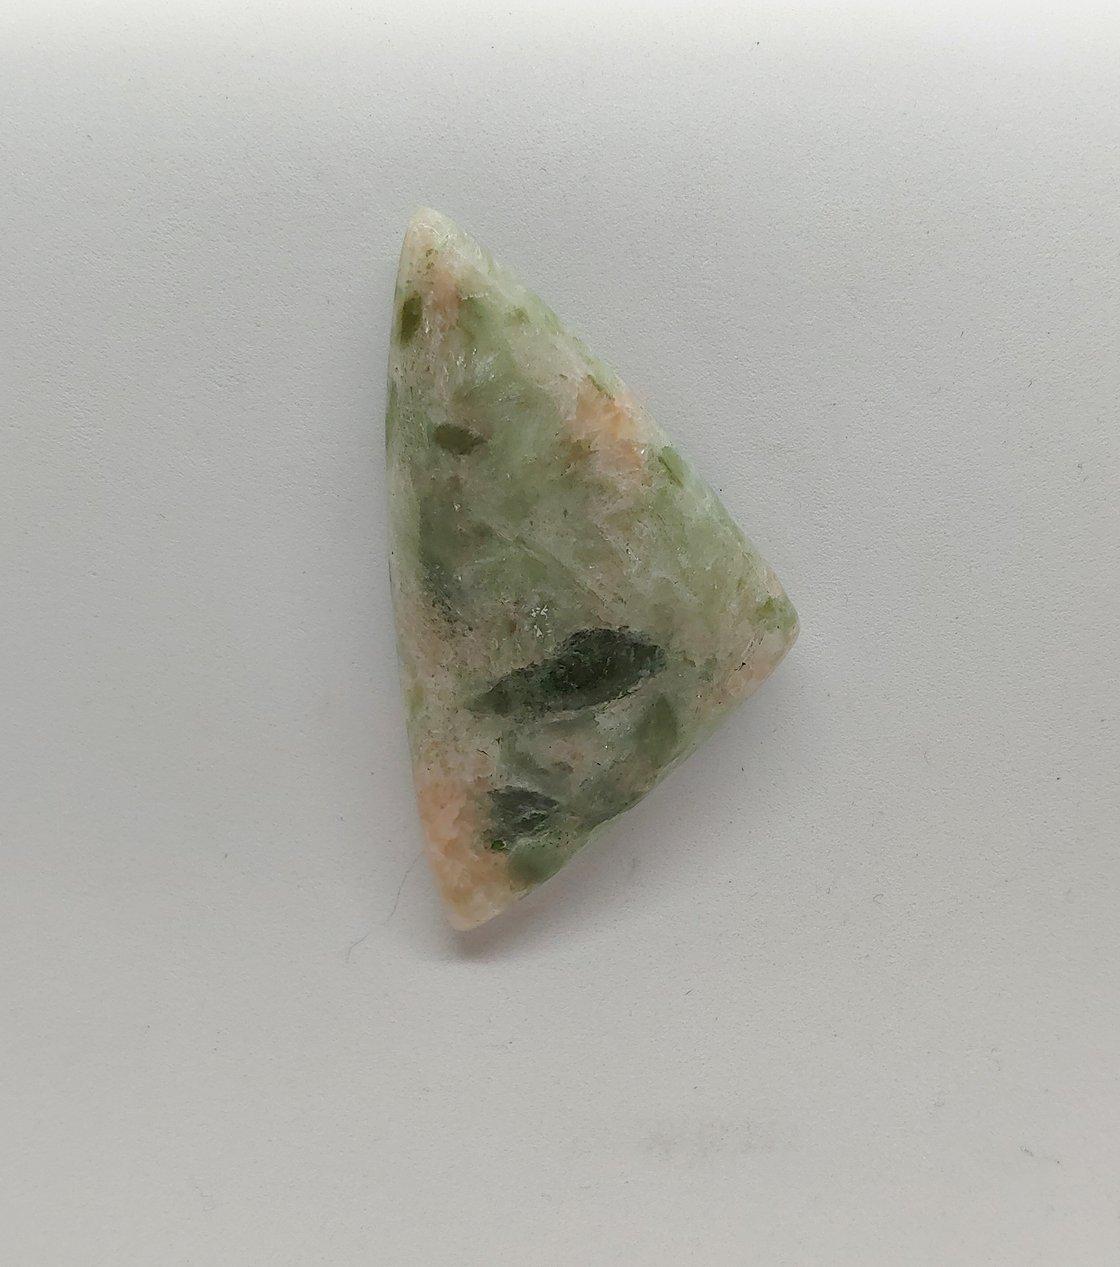 Image of Serpentine #21-522